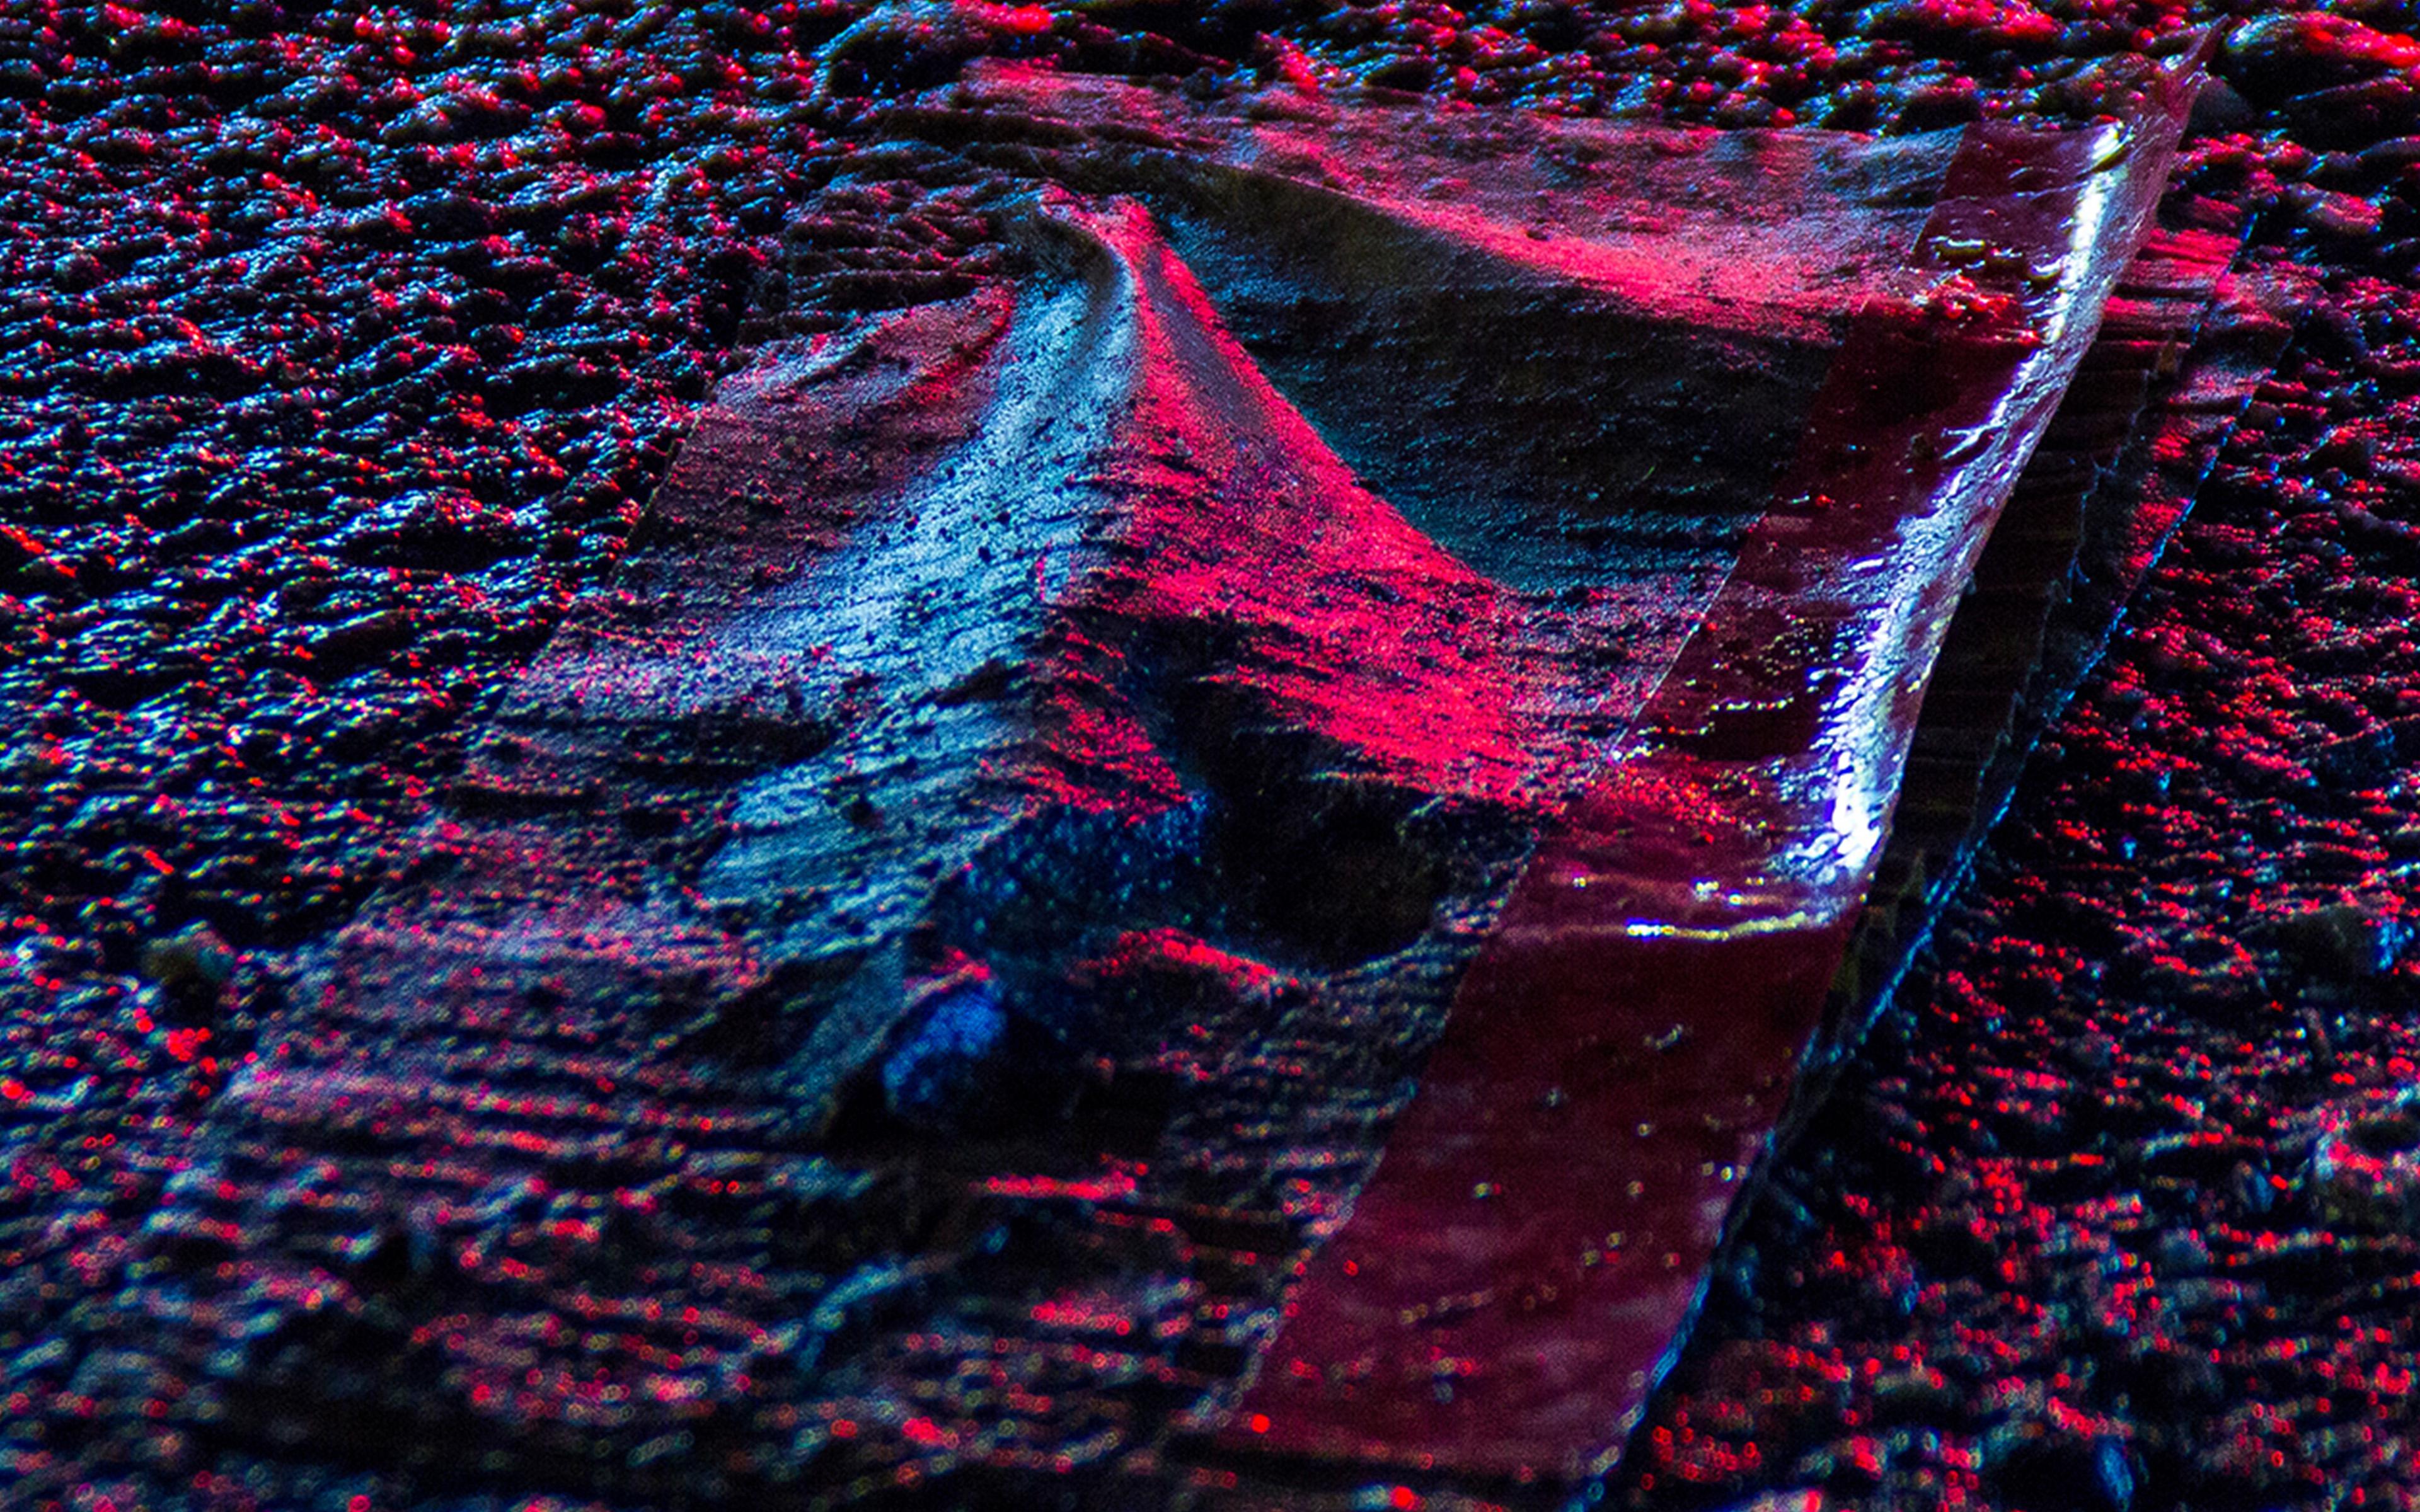 wallpaper for desktop, laptop | wa19-aspalt-road-light-red ...